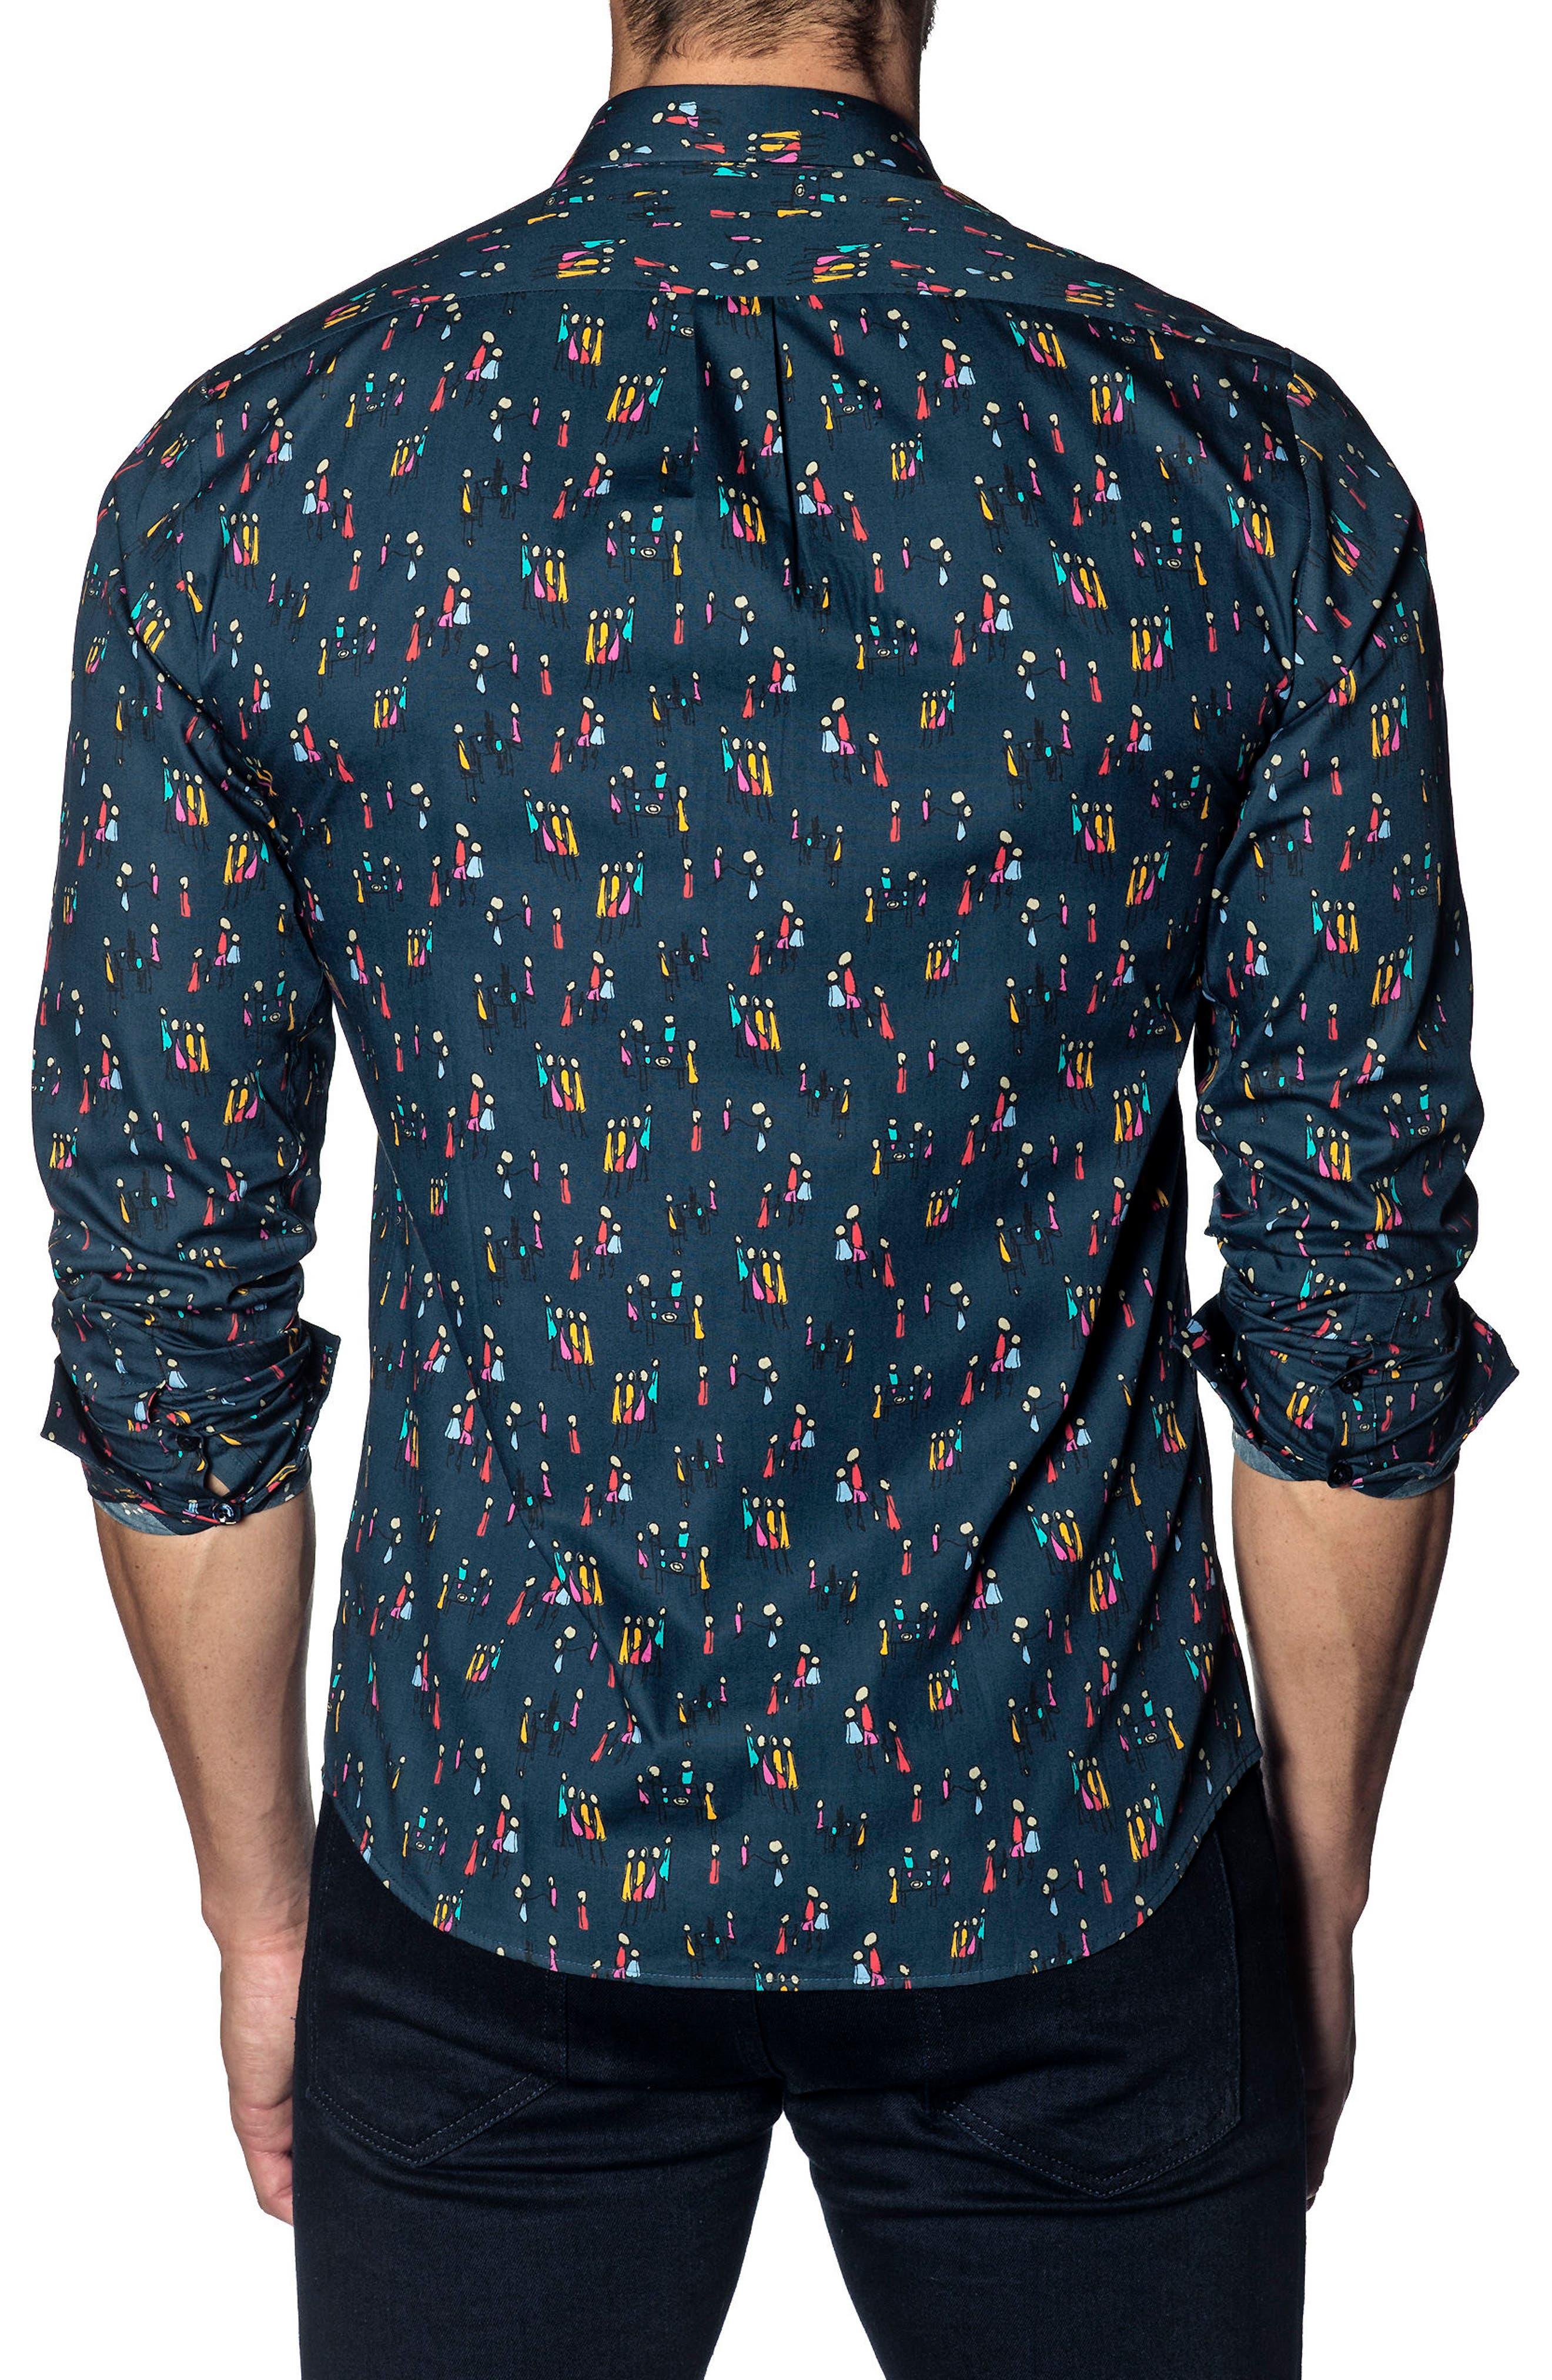 Trim Fit Sport Shirt,                             Alternate thumbnail 2, color,                             NAVY MULTI PEOPLE PRINT